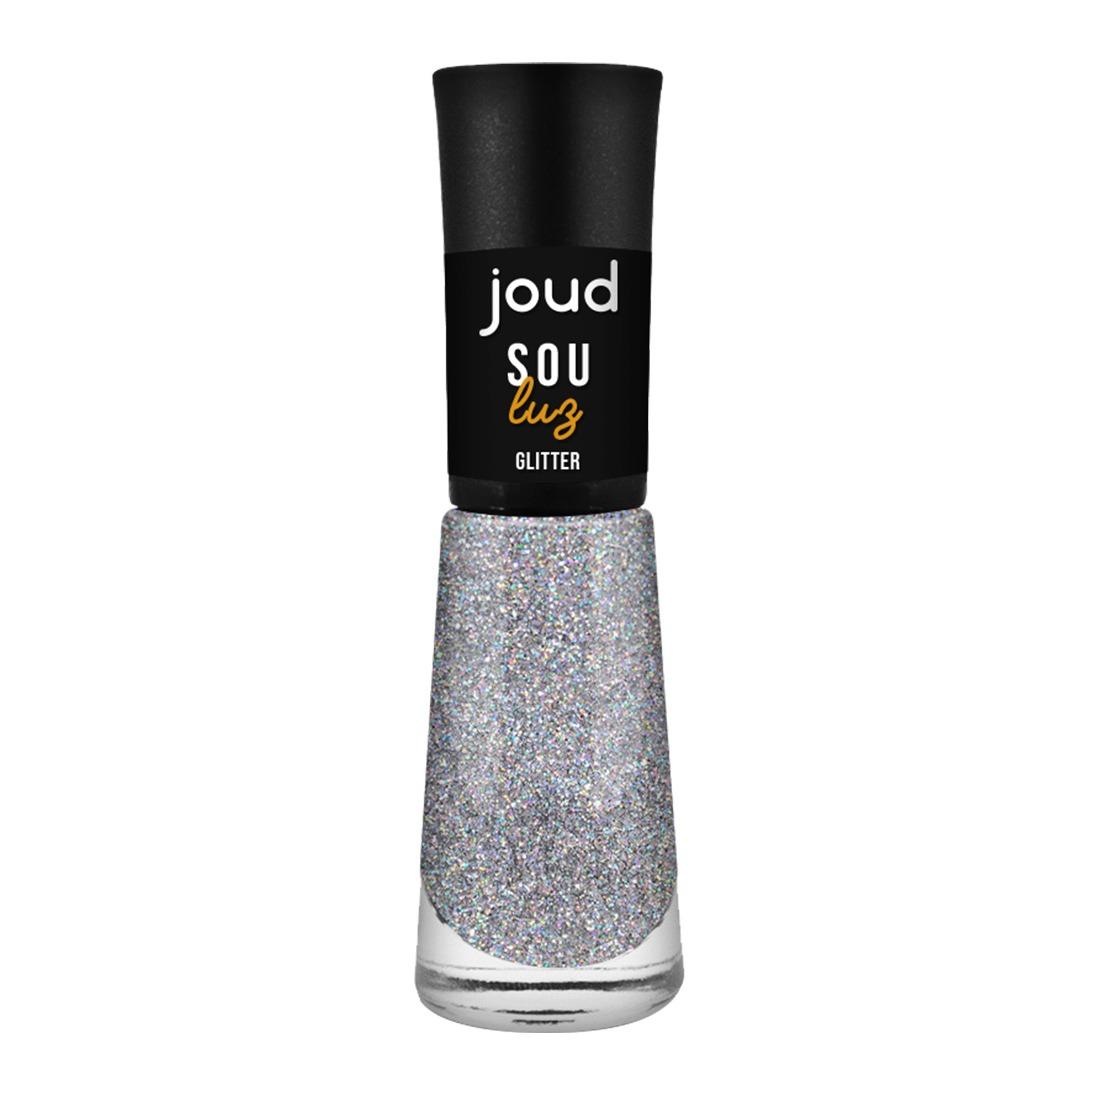 Esmalte Joud Glitter Sou Luz 8ml